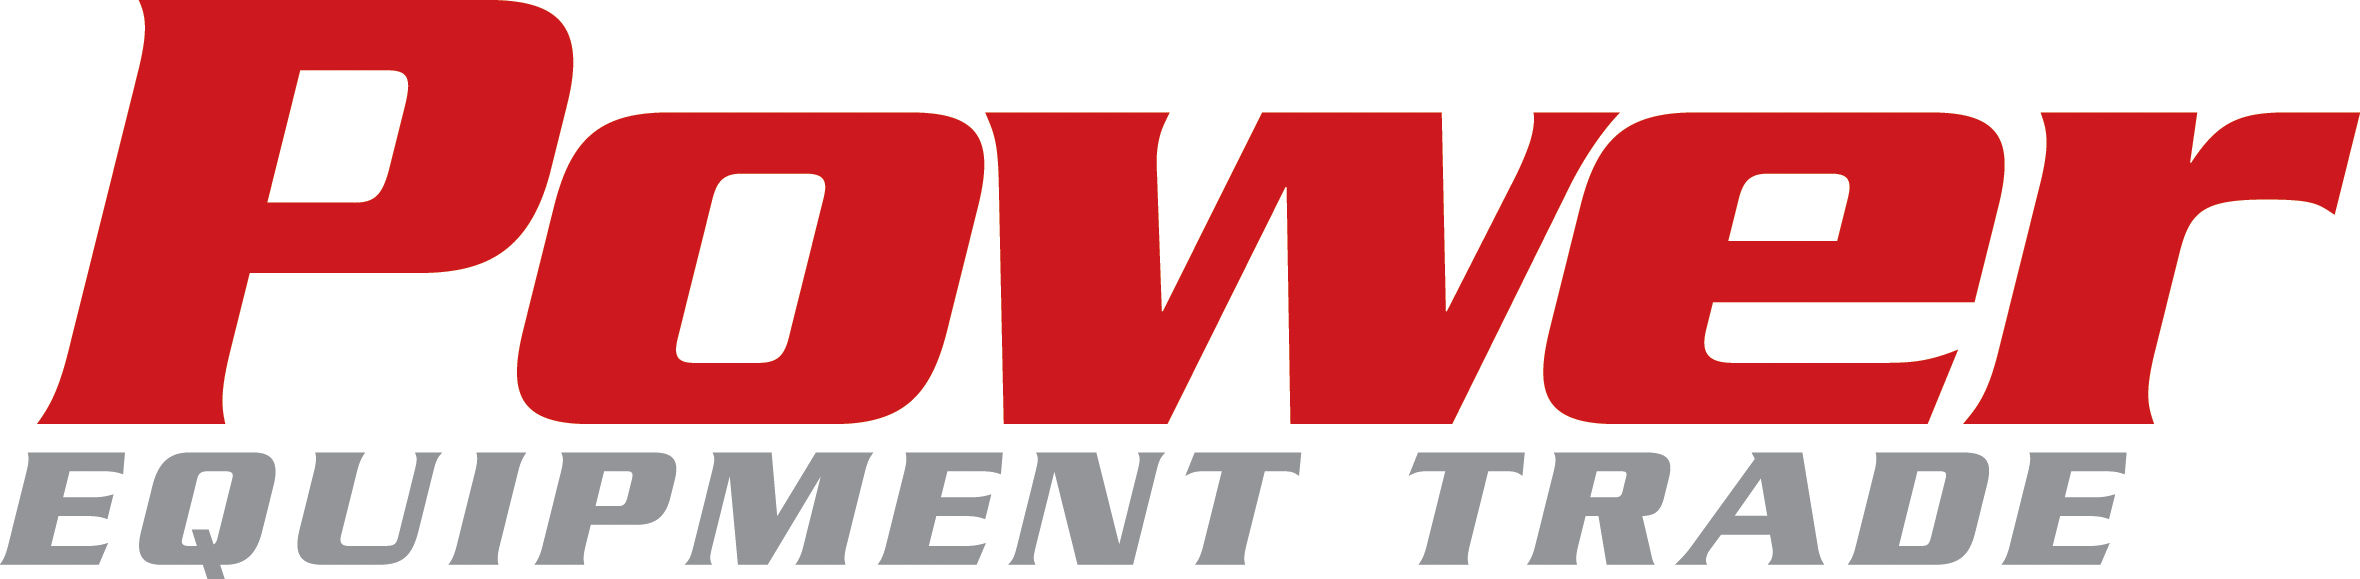 Power Equipment Trade